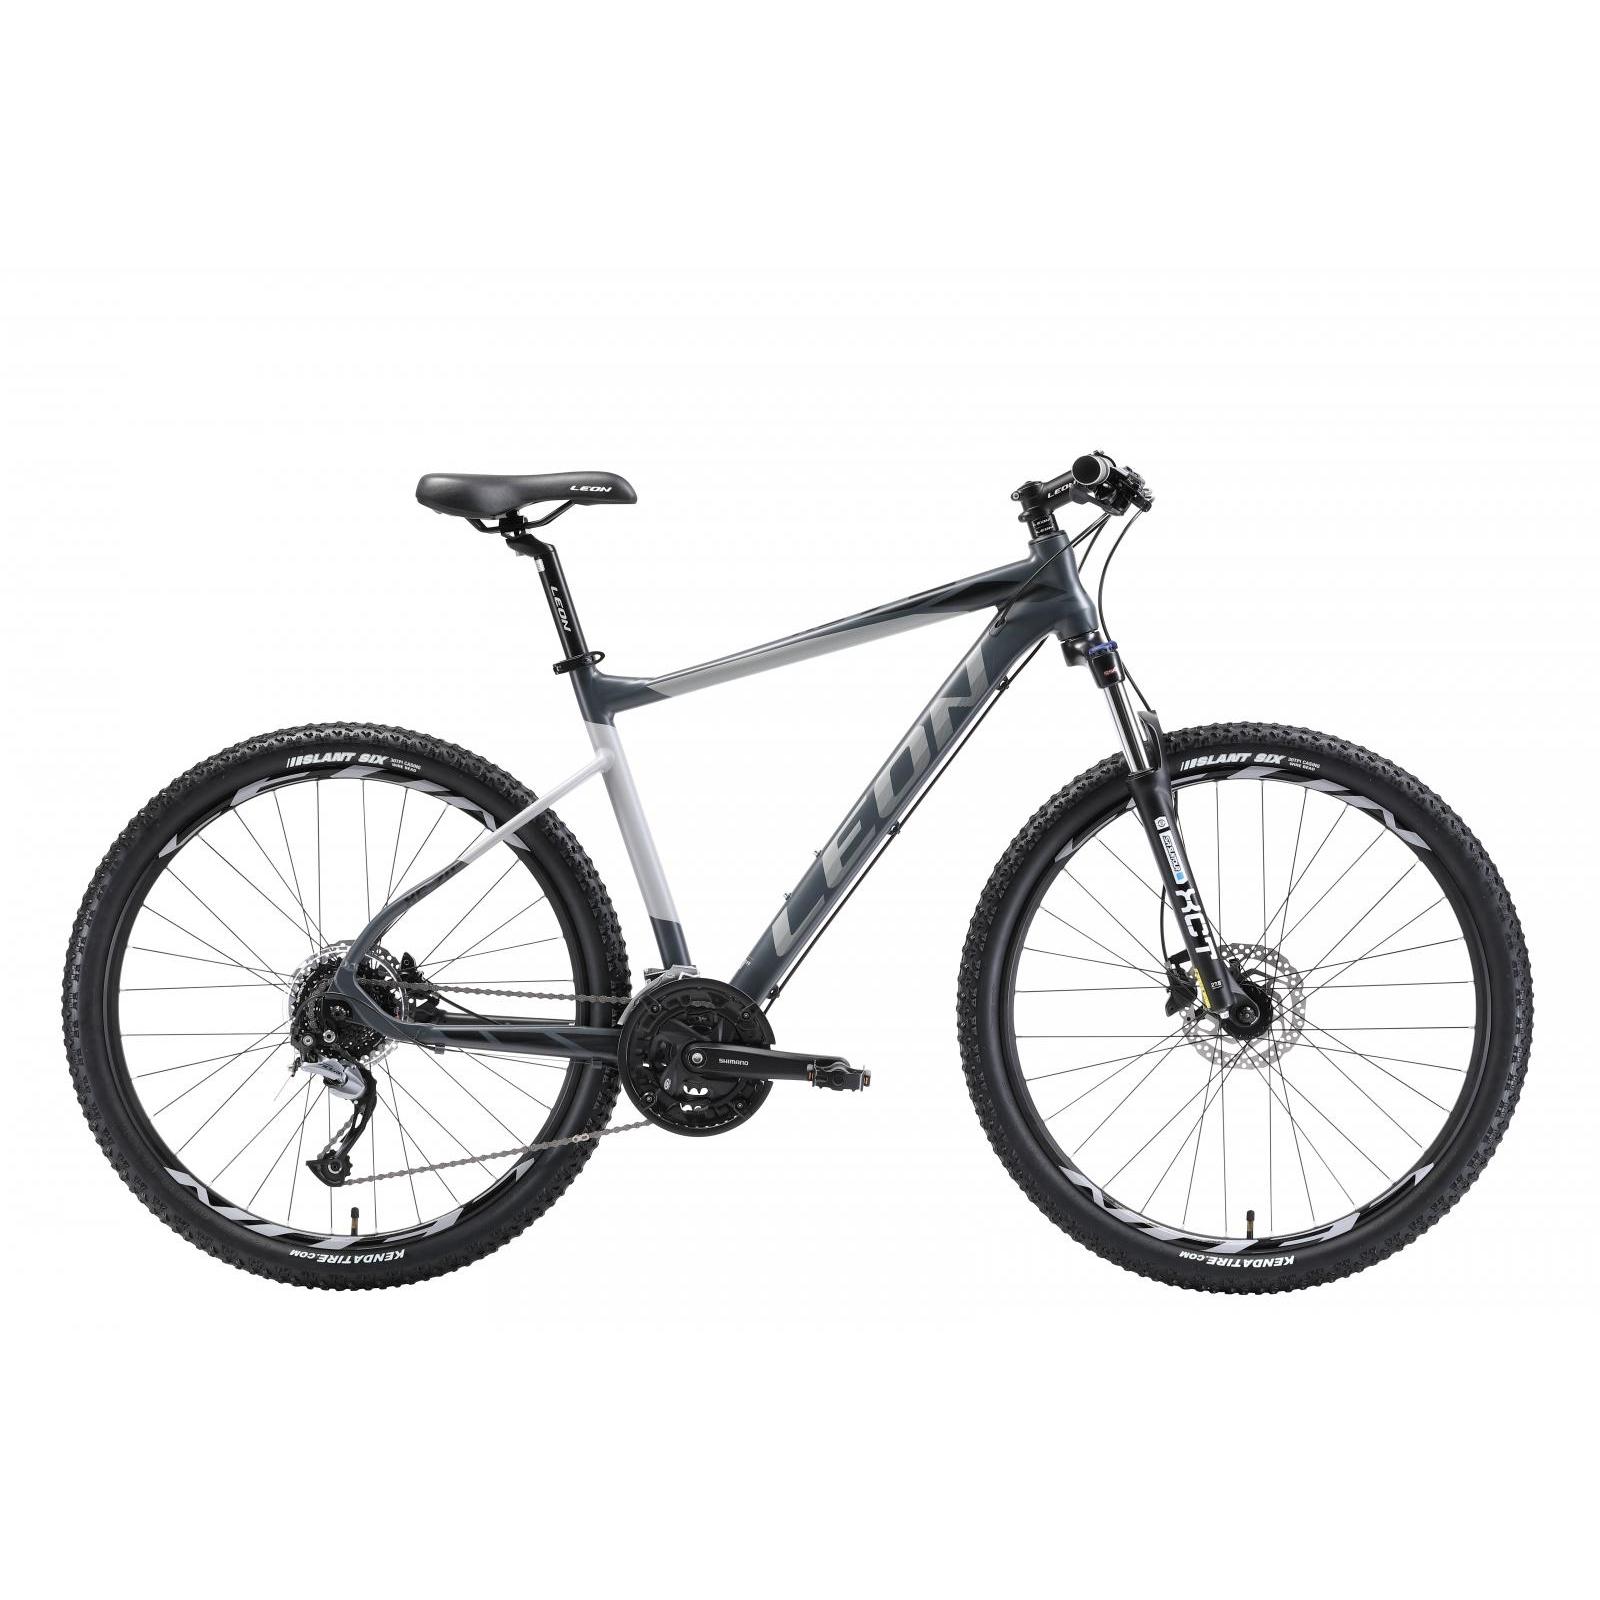 "Велосипед Leon 27.5"" XC-70 2018 AM Hydraulic lock out 14G HDD рама-18"" Al (OPS-LN-27.5-027)"